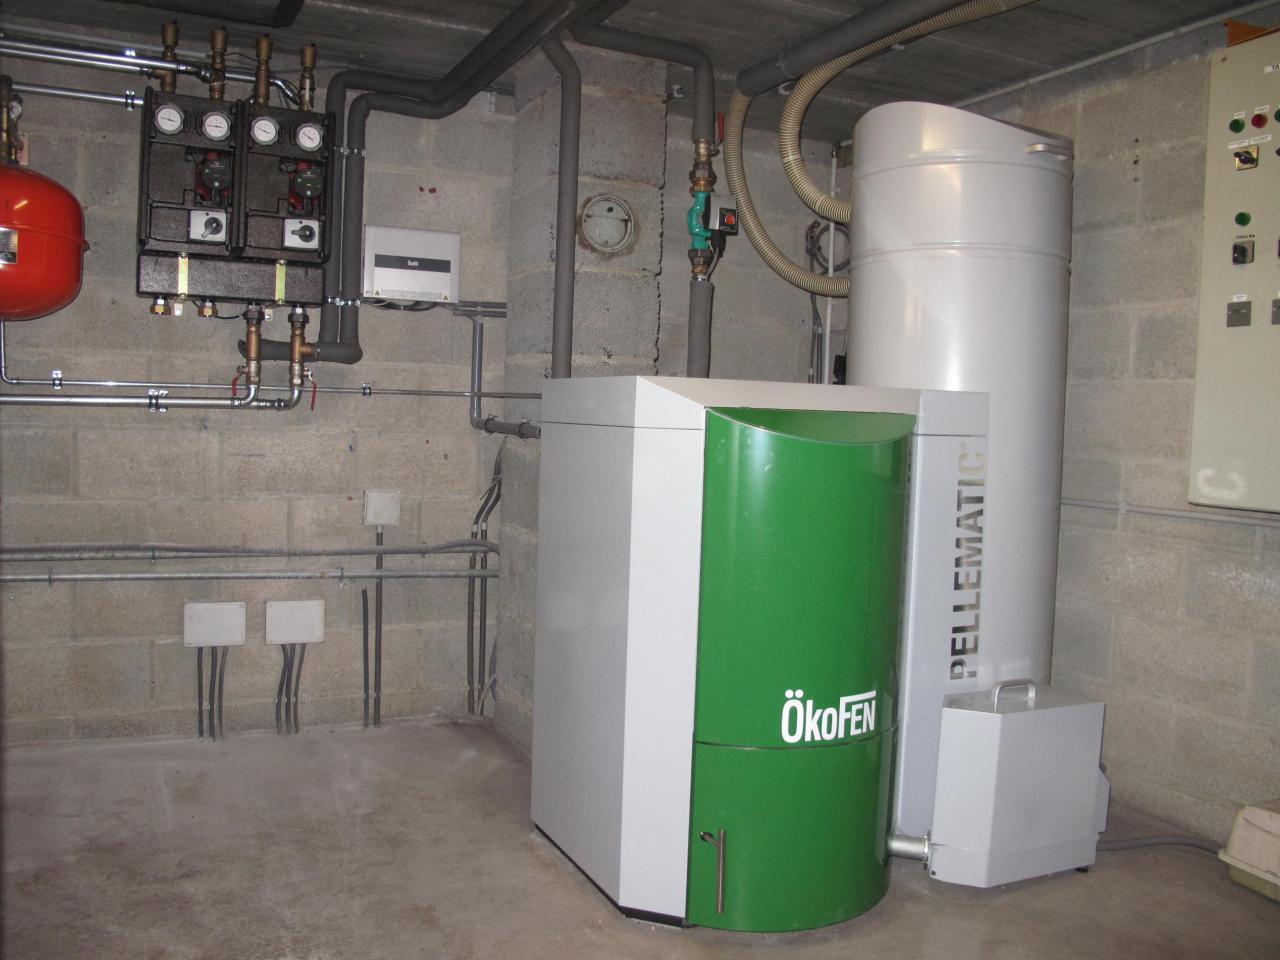 Delmelle Energies Okofen PEB avec aspirateur PES